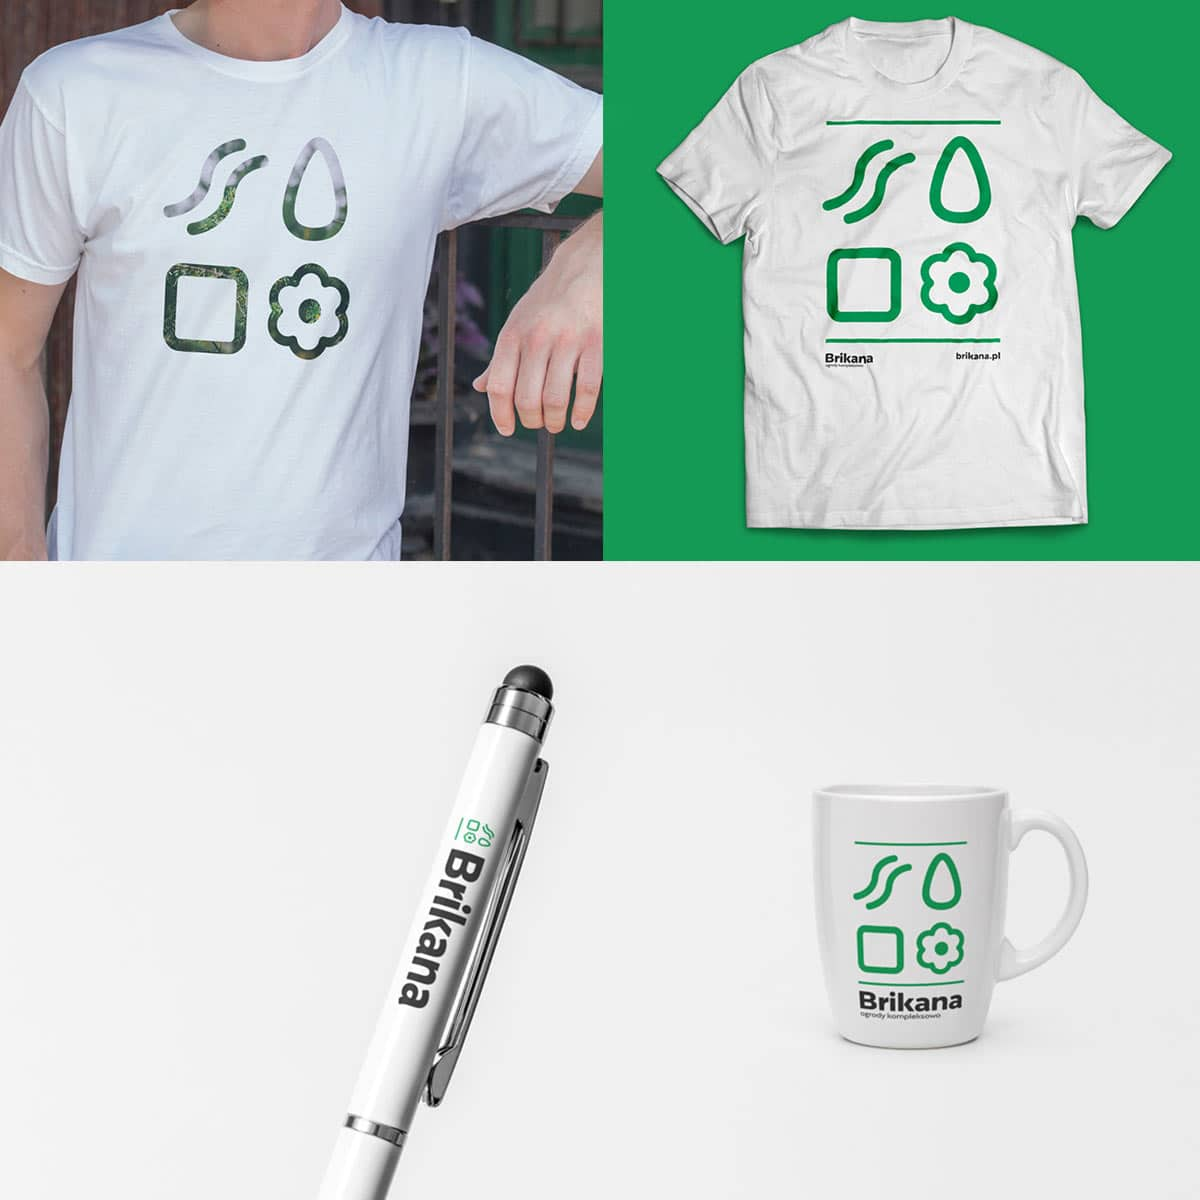 koszulka kubek długopis projekt brikana